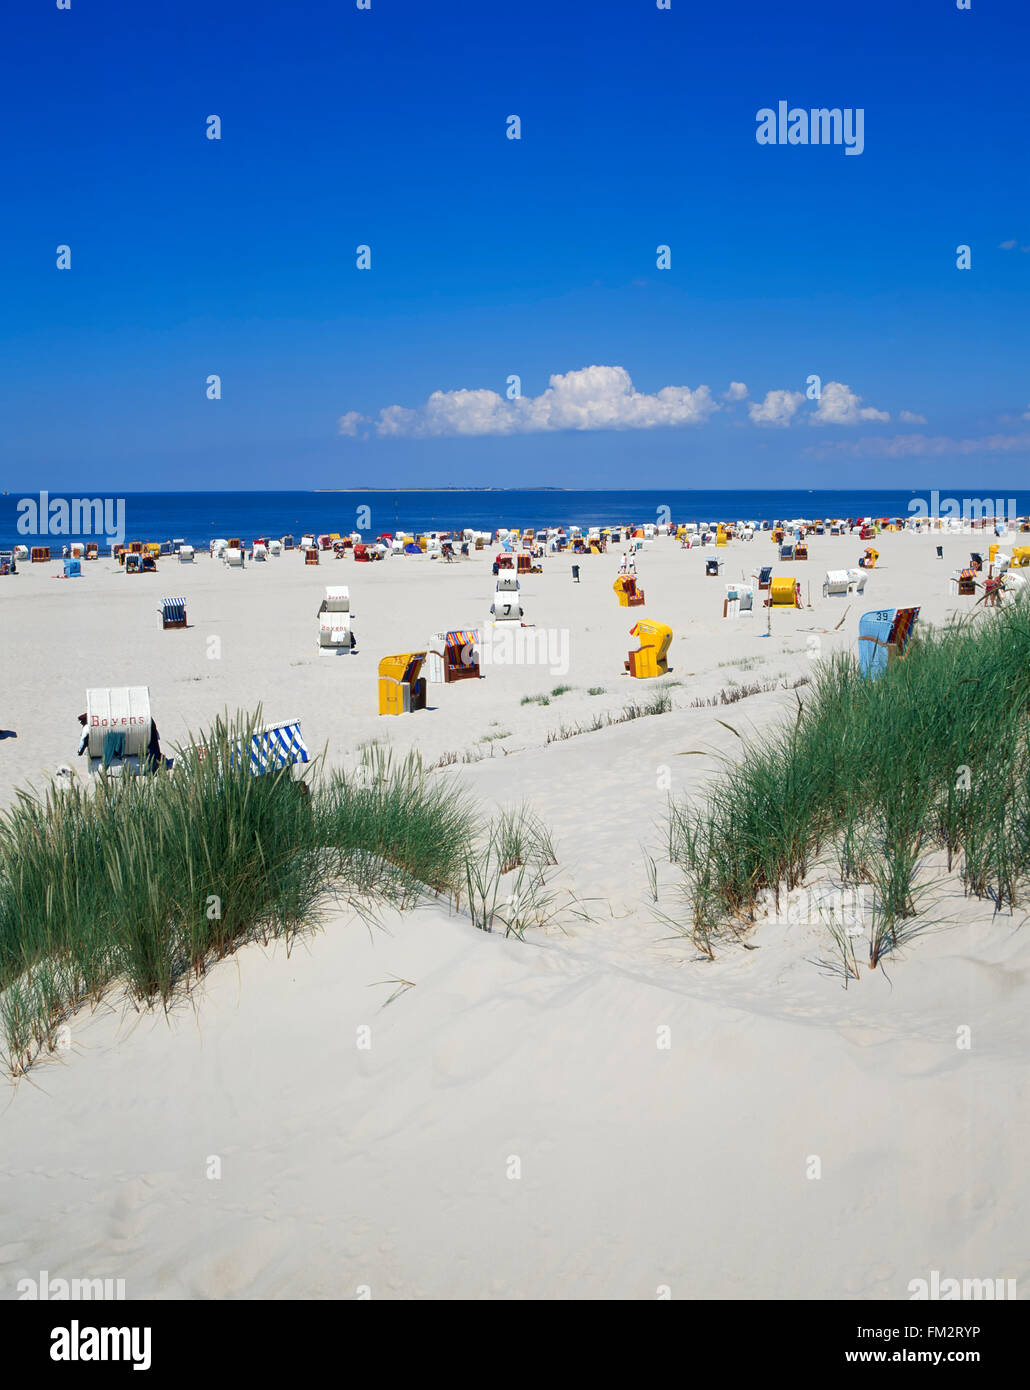 Norddorf, Kniepsand beach, Amrum island, North Sea, Schleswig-Holstein, Germany, Europe - Stock Image